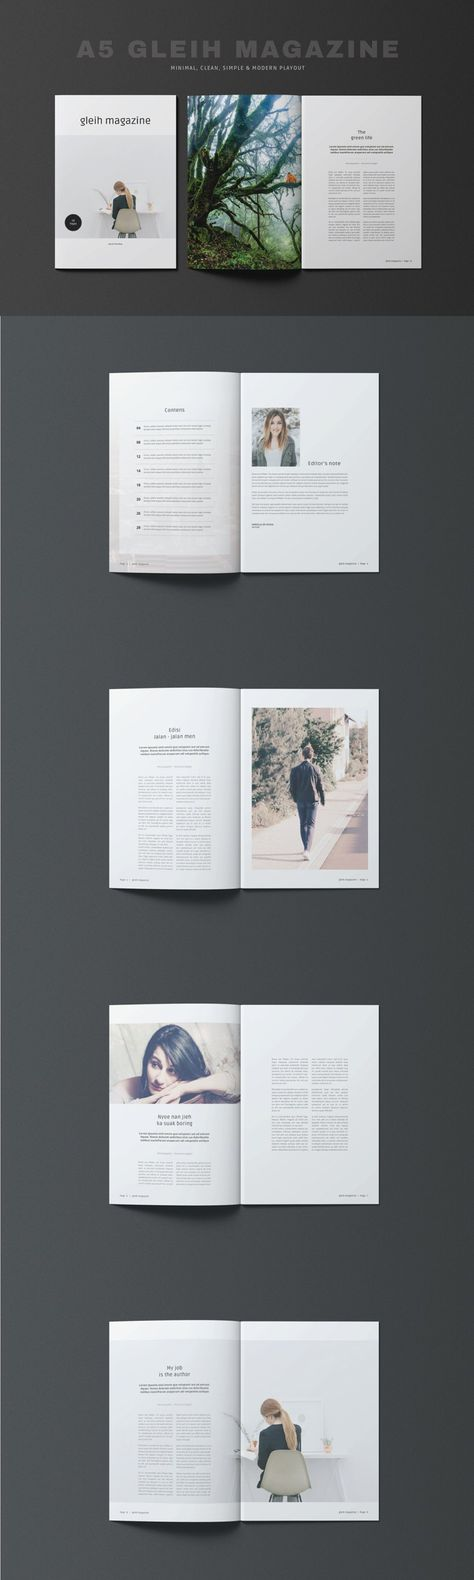 A5 Gleih Magazine